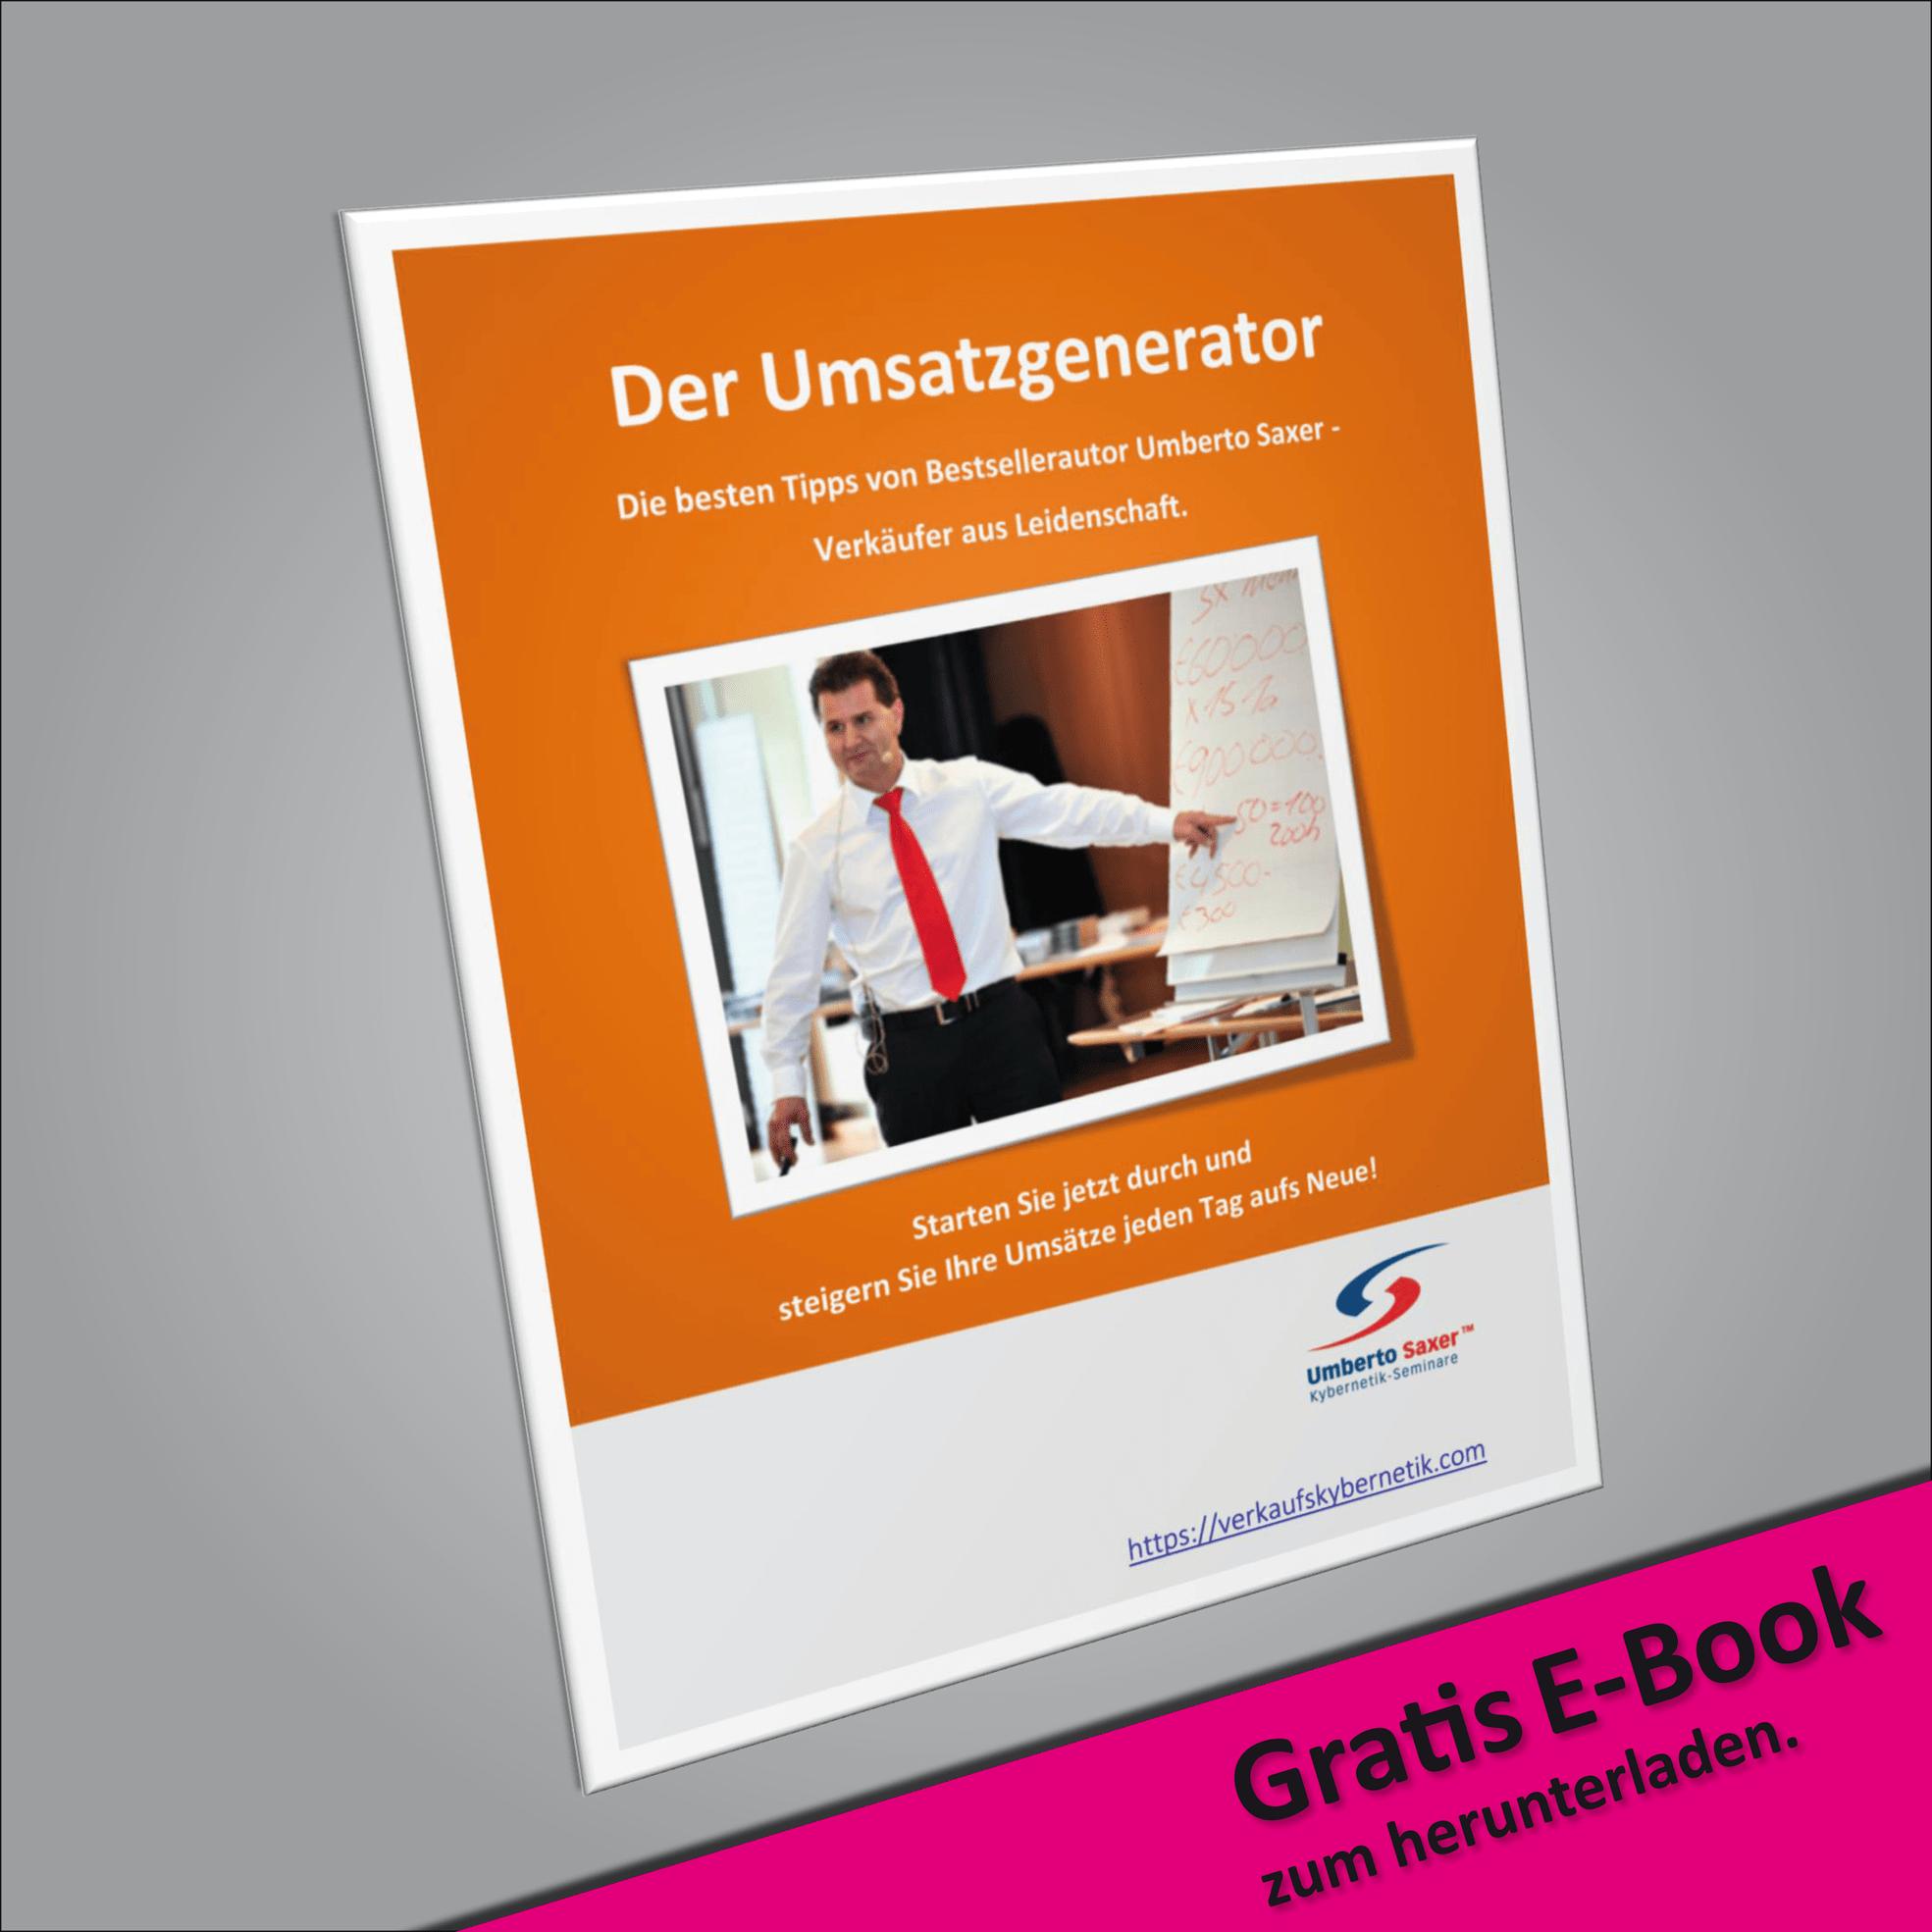 Umberto-Saxer-Training-Umsatzgenerator-Cover